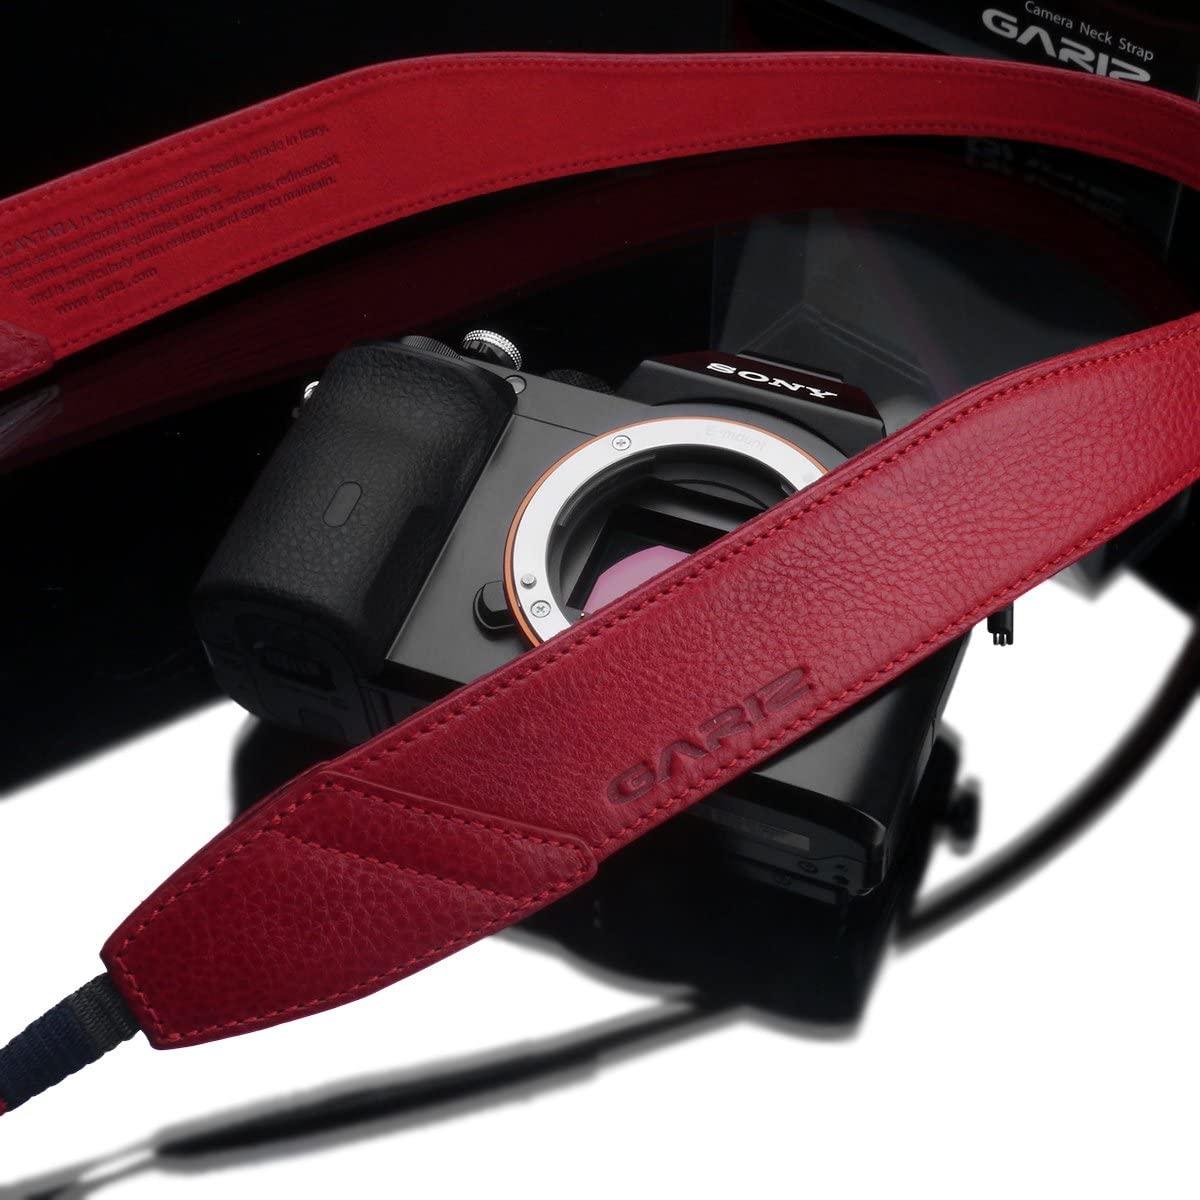 Gariz Italian Leather with Alcantara Version AT-DSLAR Neck Strap for Mirrorless Cameras, Red